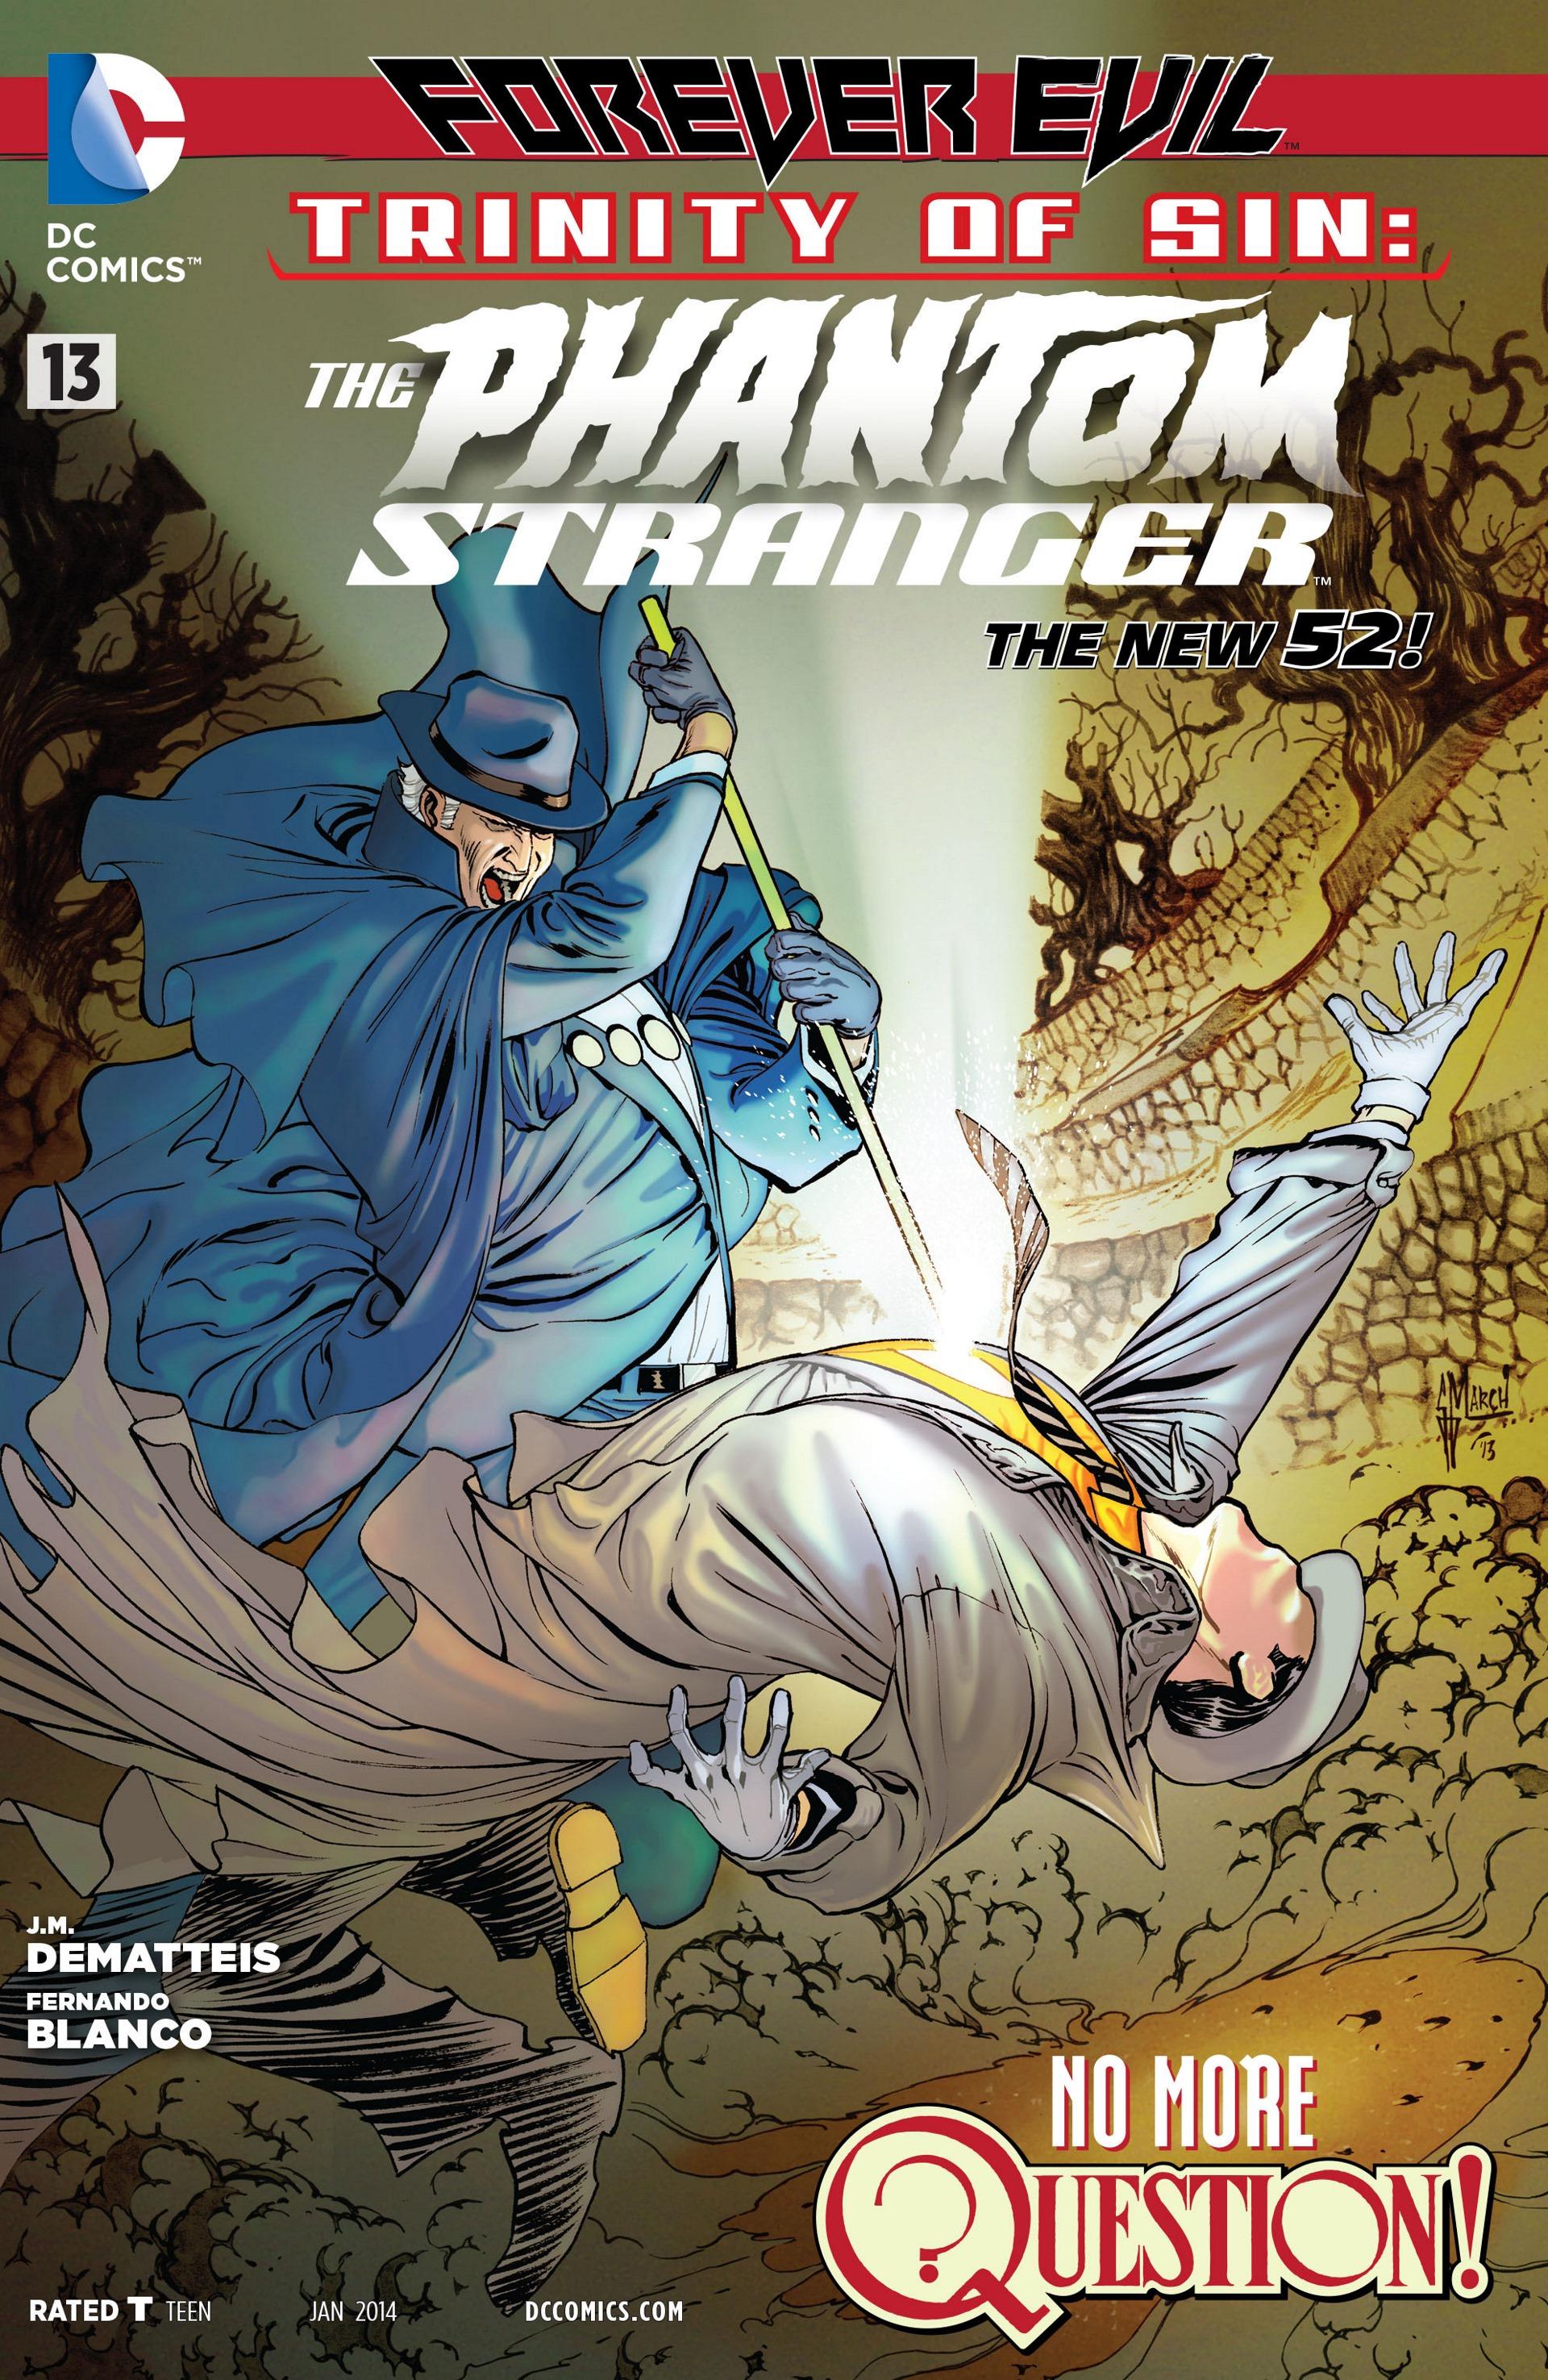 Read online Trinity of Sin: The Phantom Stranger comic -  Issue #13 - 1